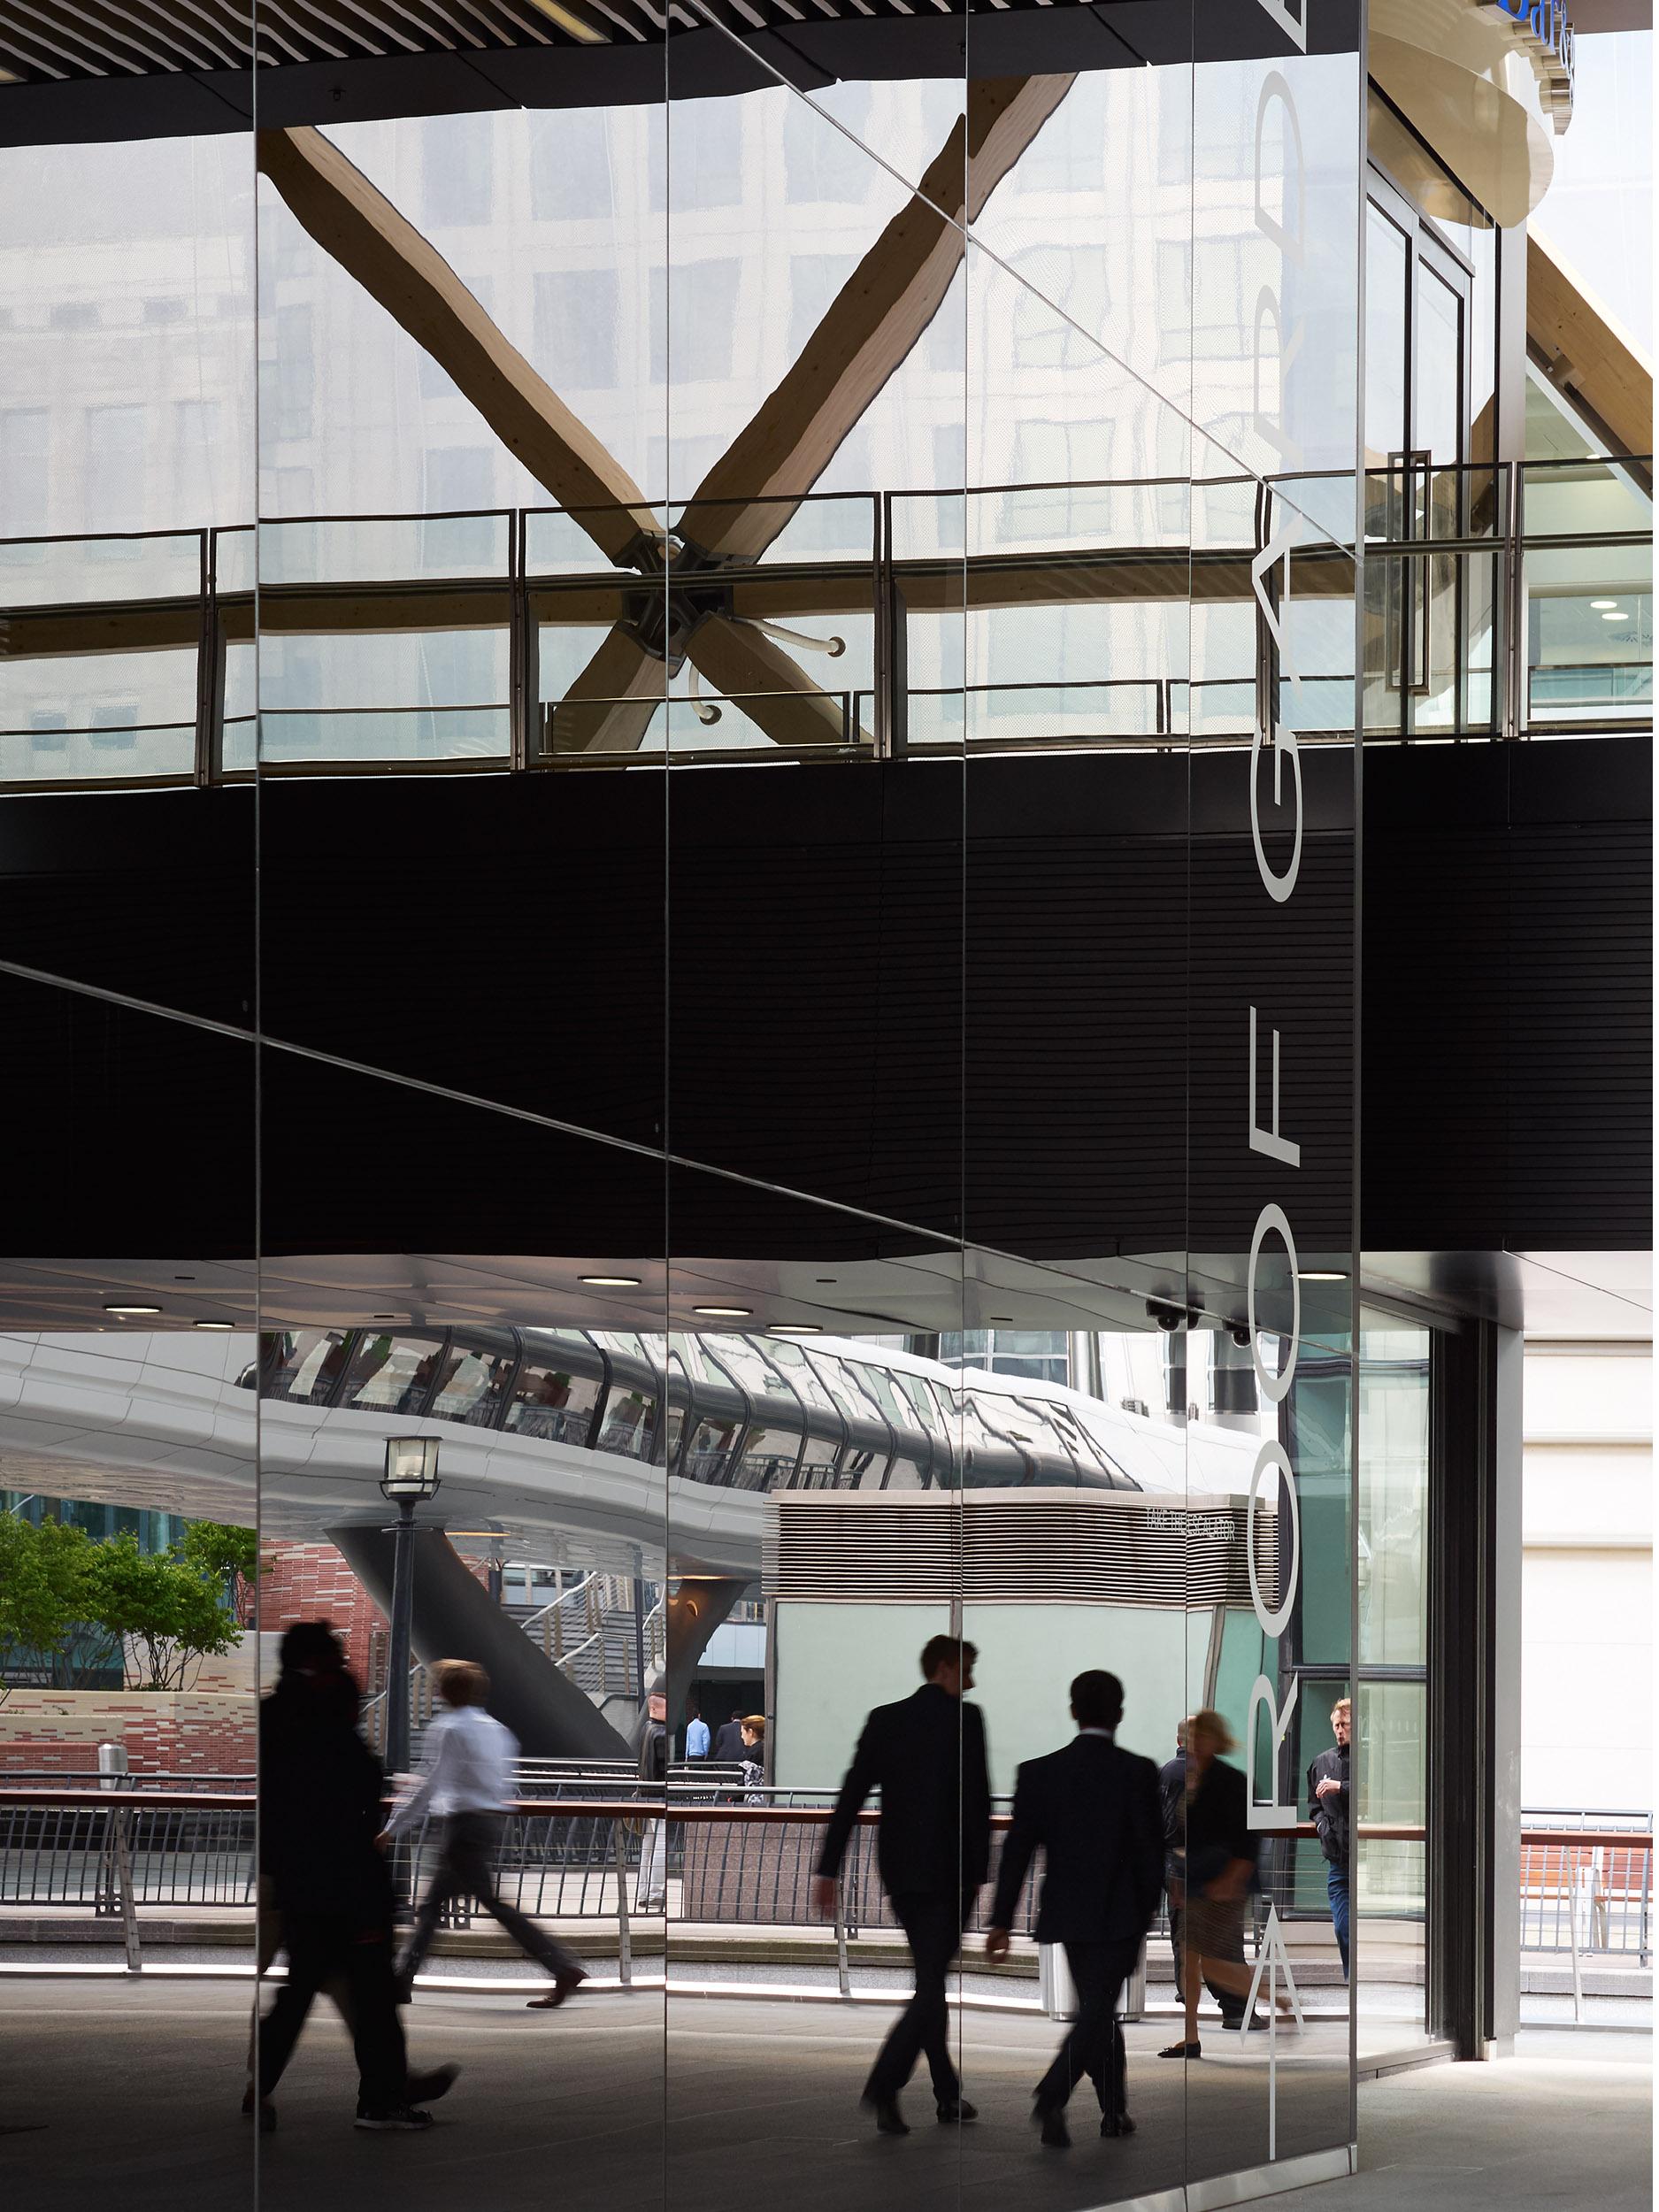 NGUT-1200-Crossrail-0040.jpg